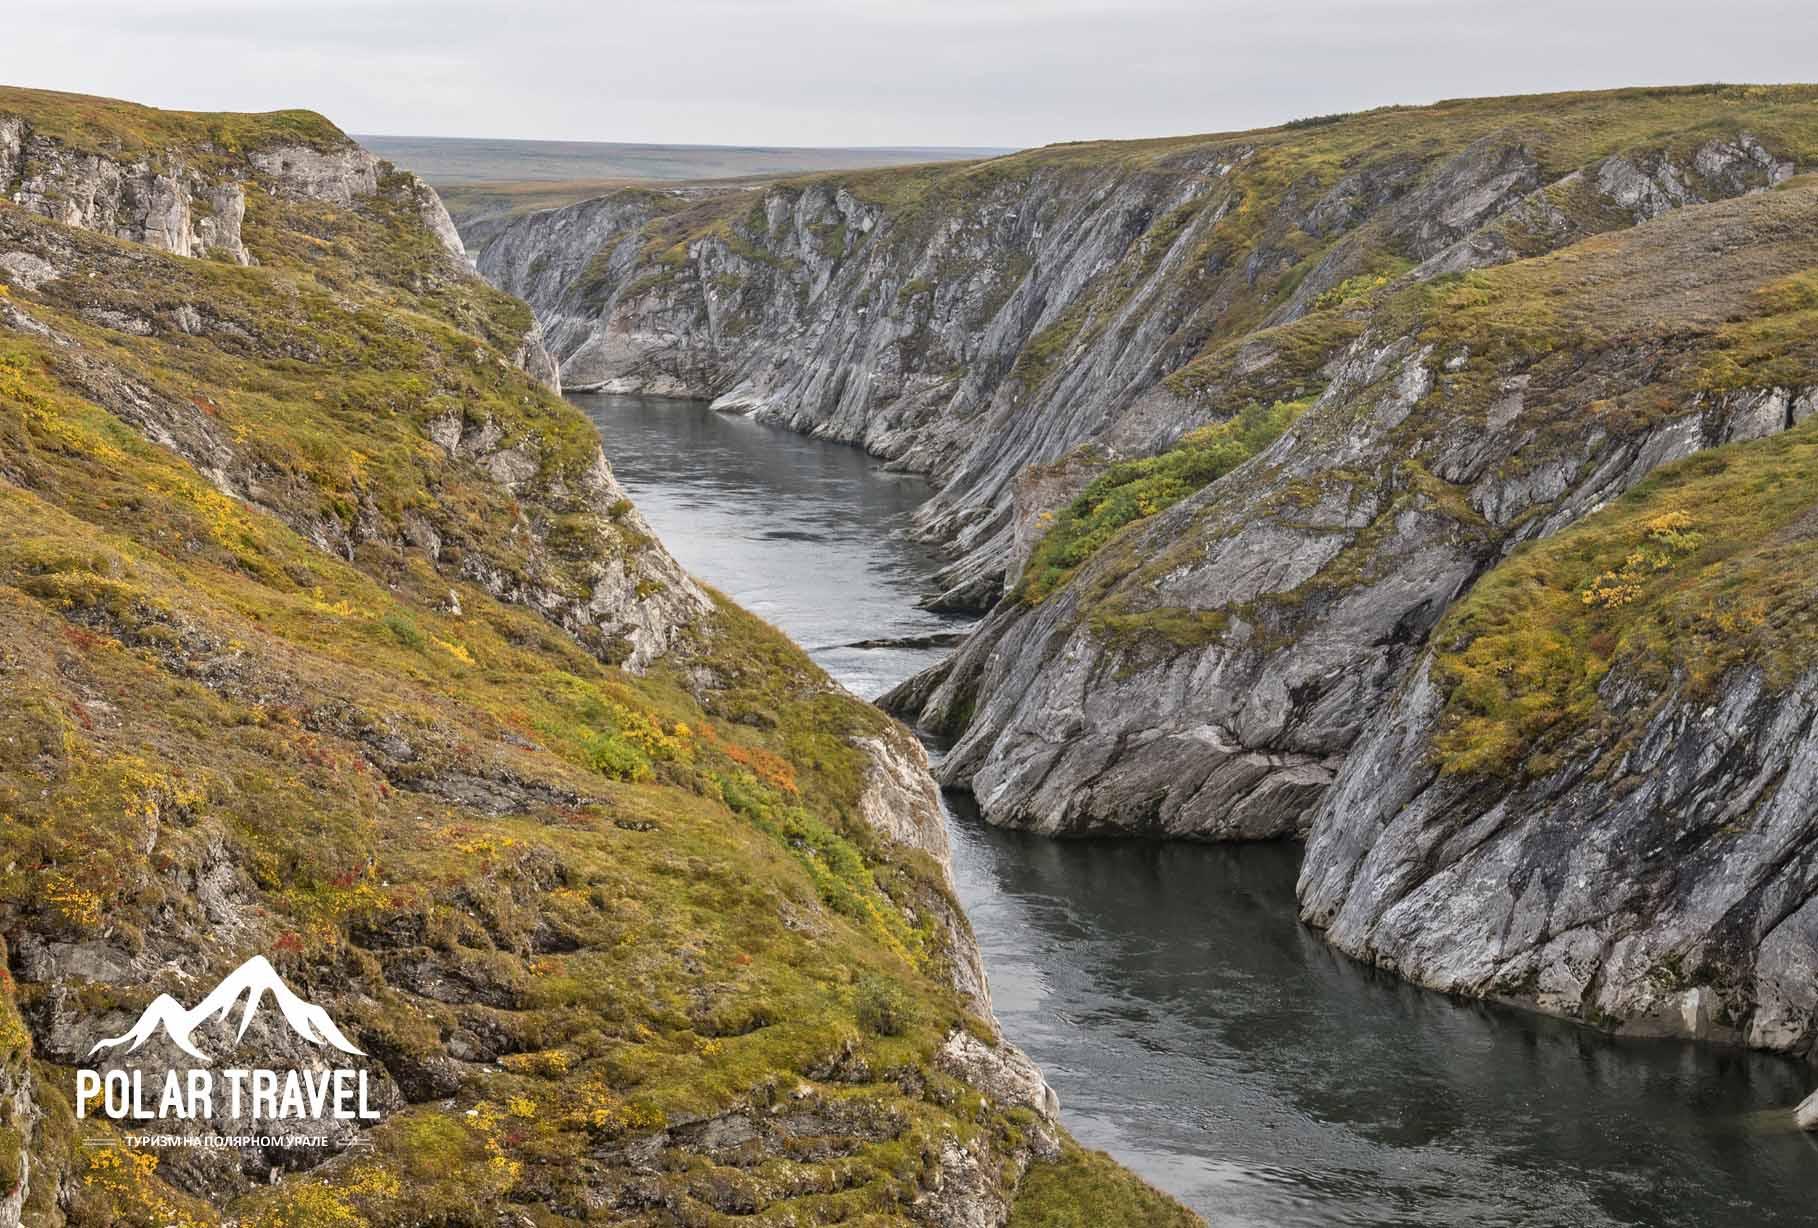 Беломраморный каньон, река Кара.